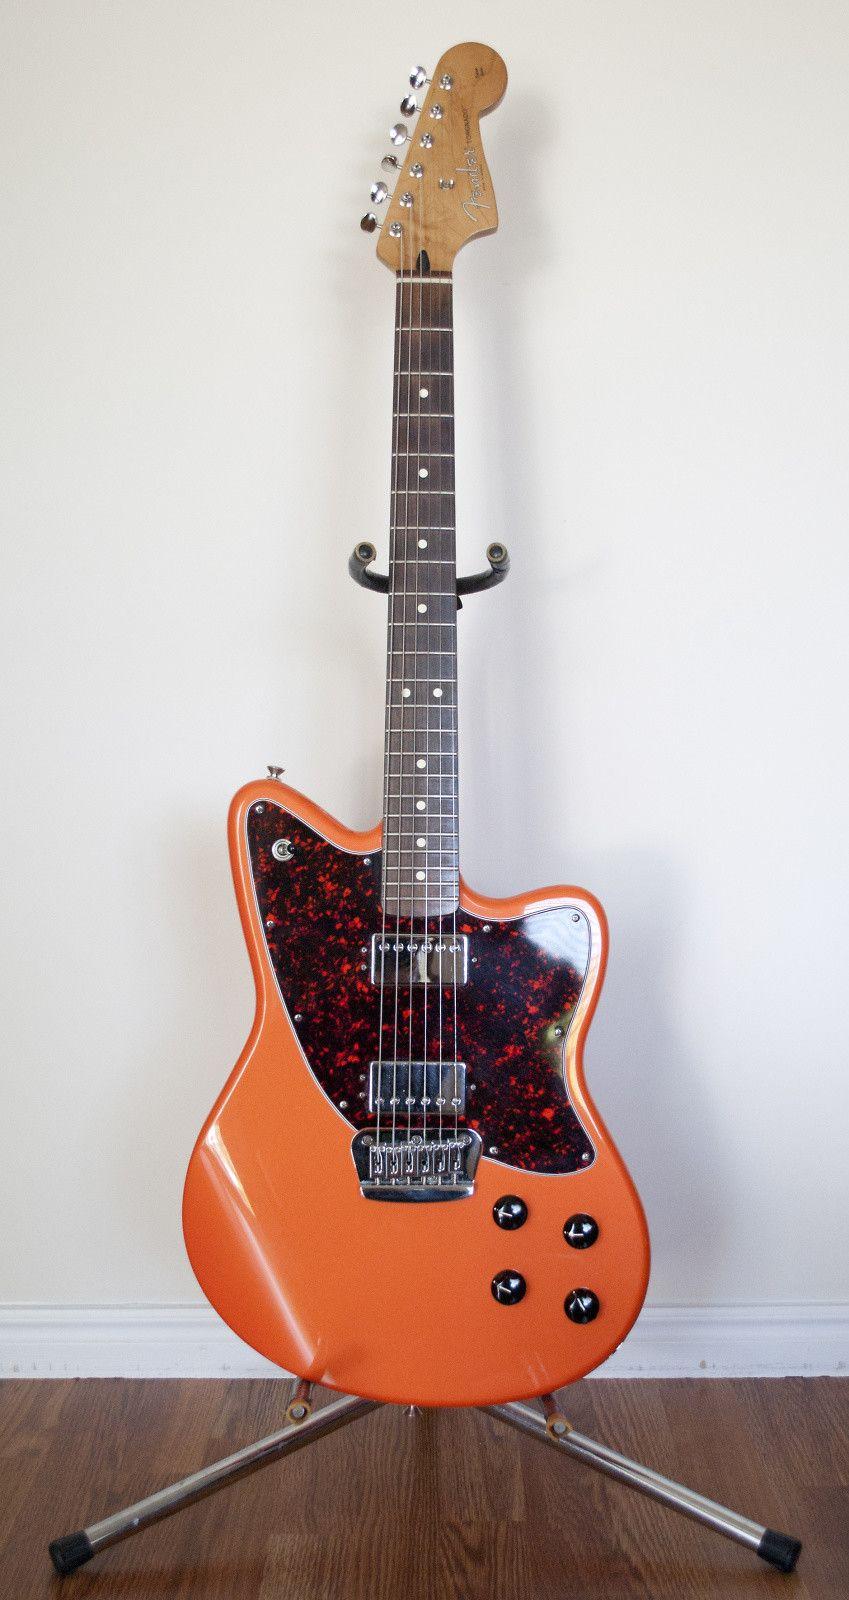 2002 fender toronado in creamsicle orange finish fender guitars 2002 fender toronado in creamsicle orange finish sciox Choice Image